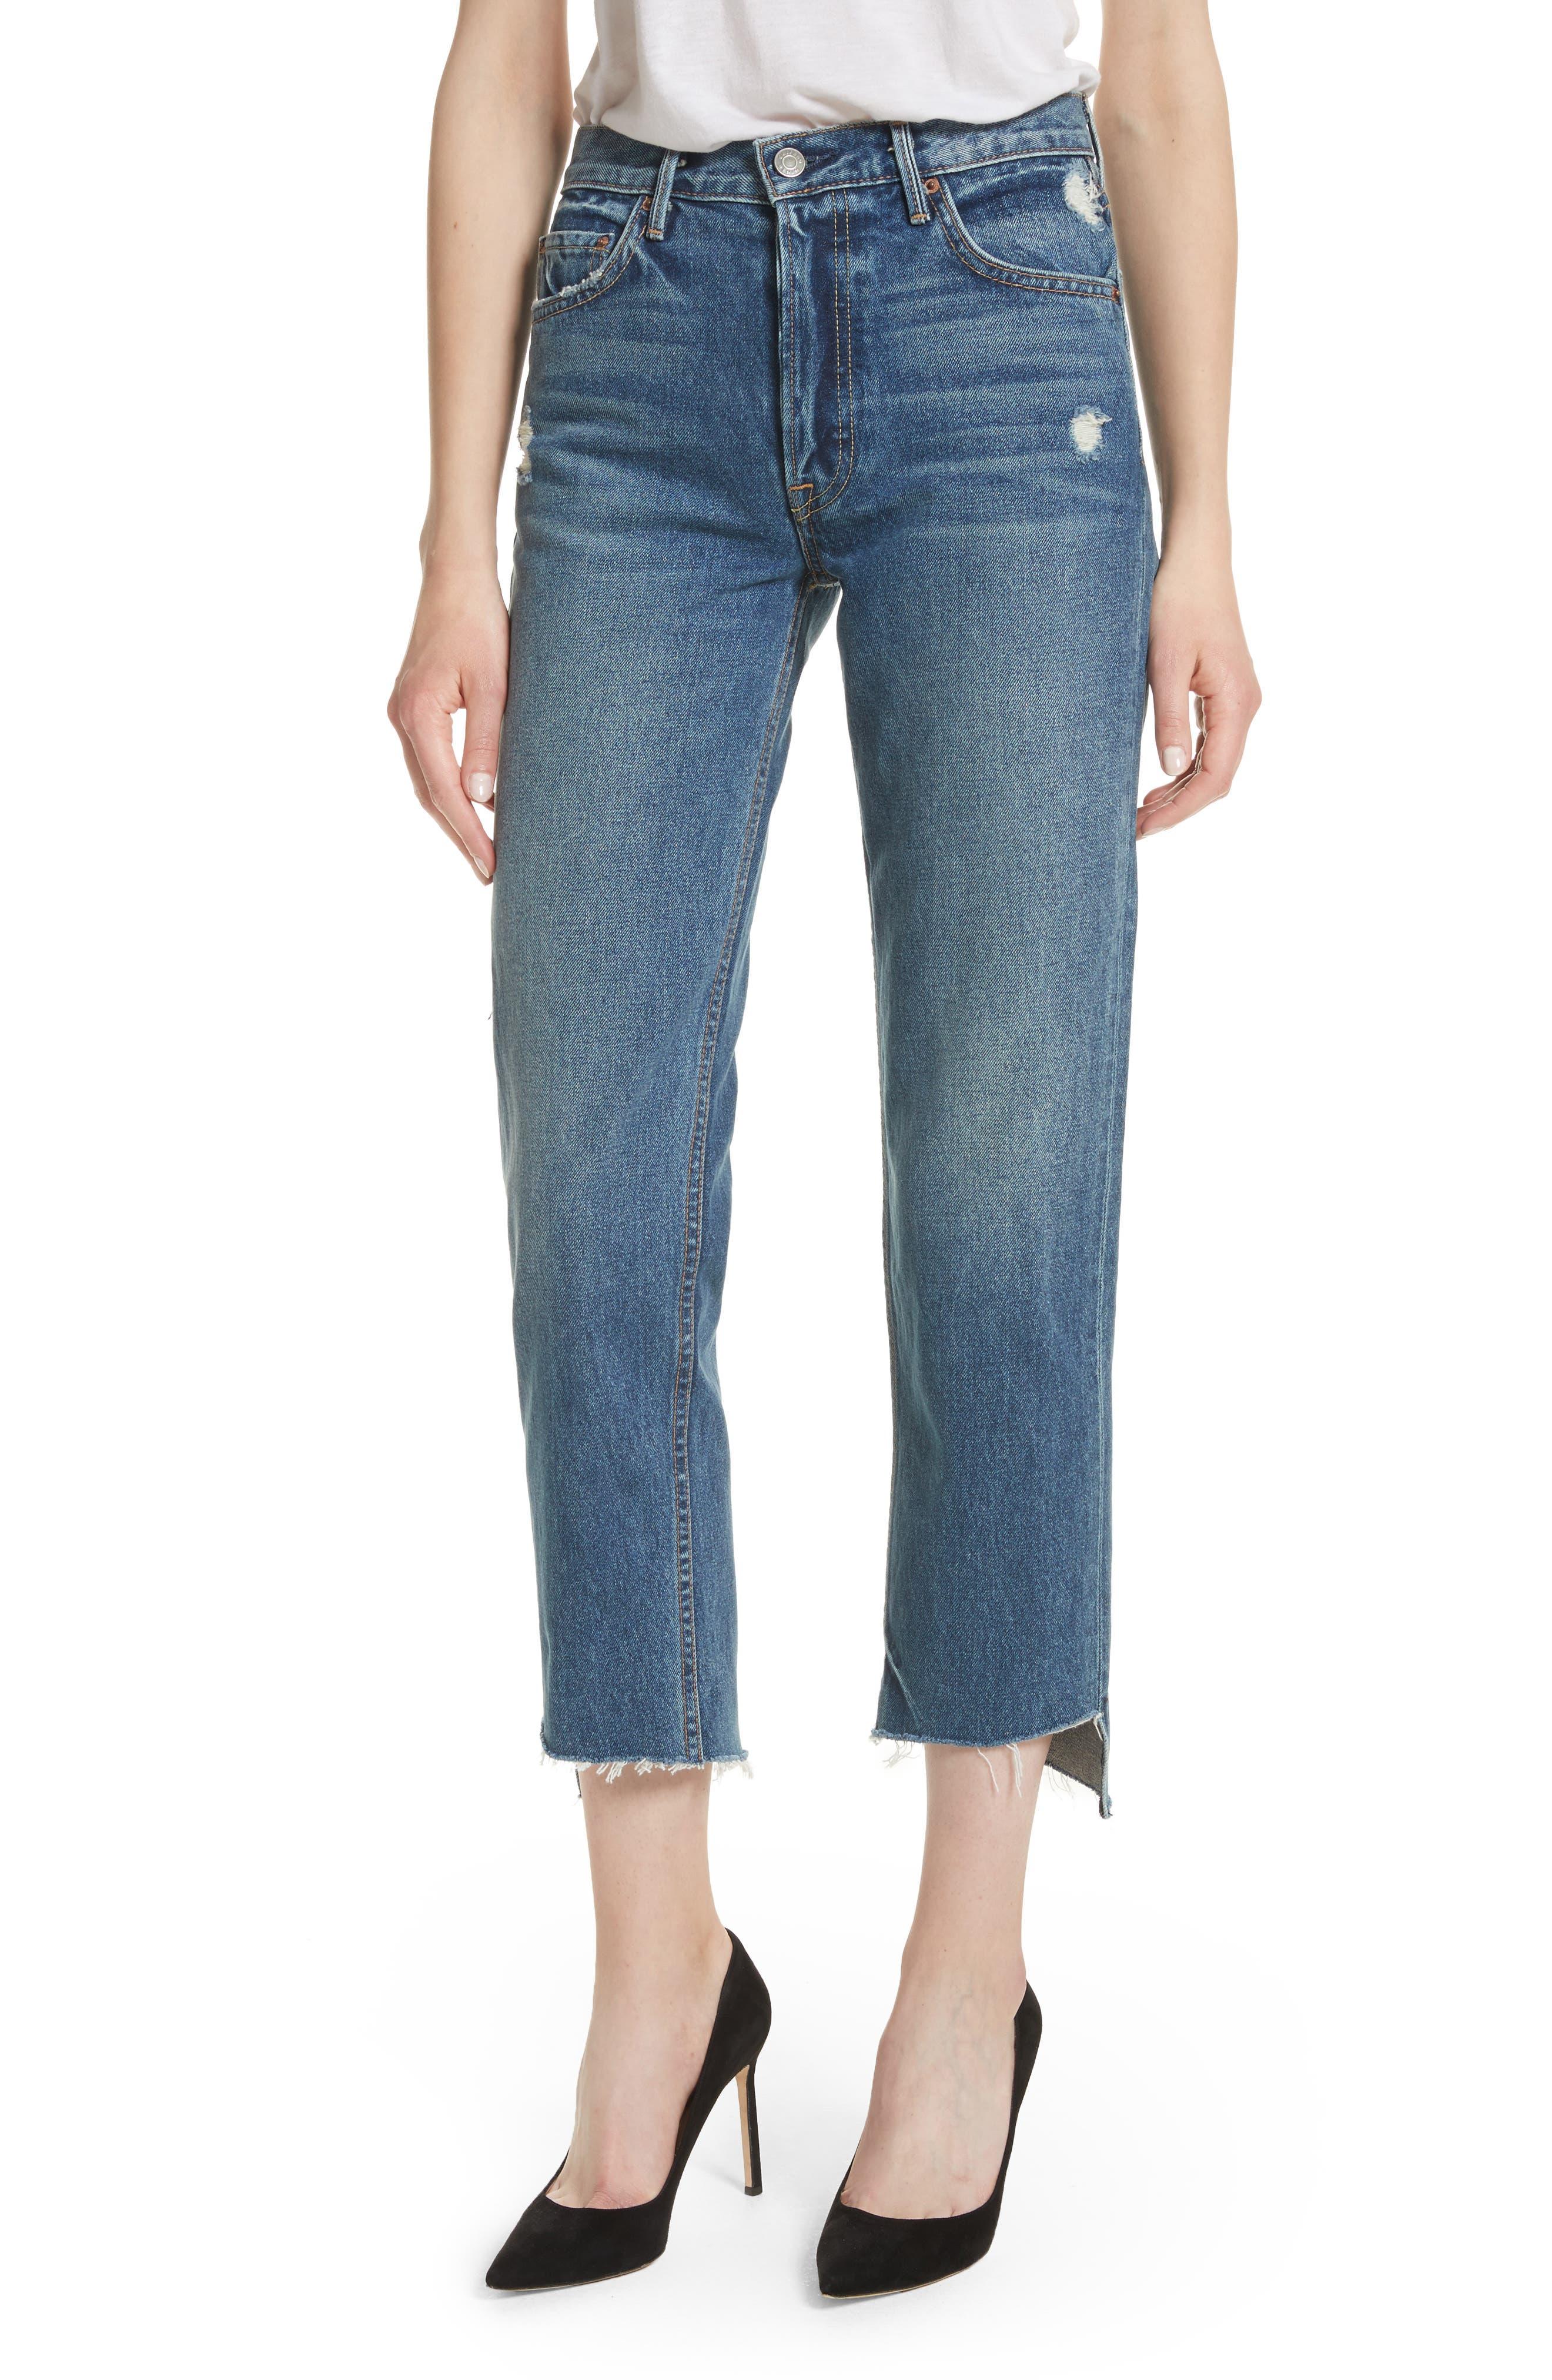 Main Image - GRLFRND Helena Rigid High Waist Straight Jeans (Close To You)